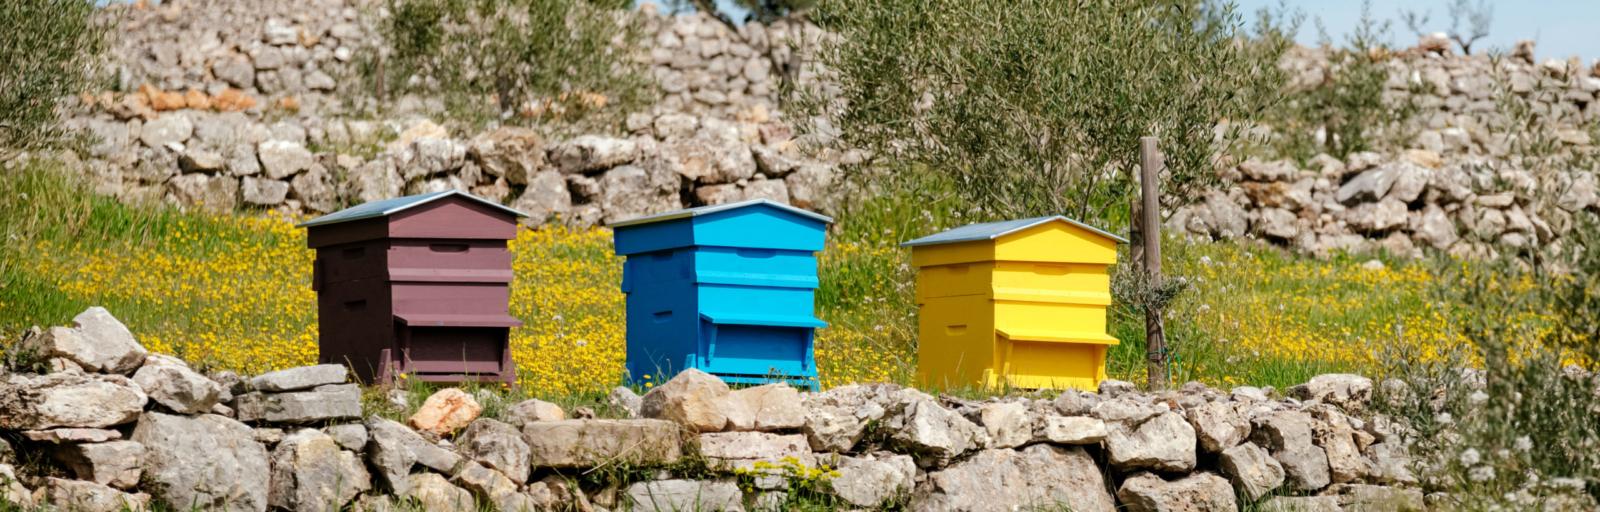 trio de ruches